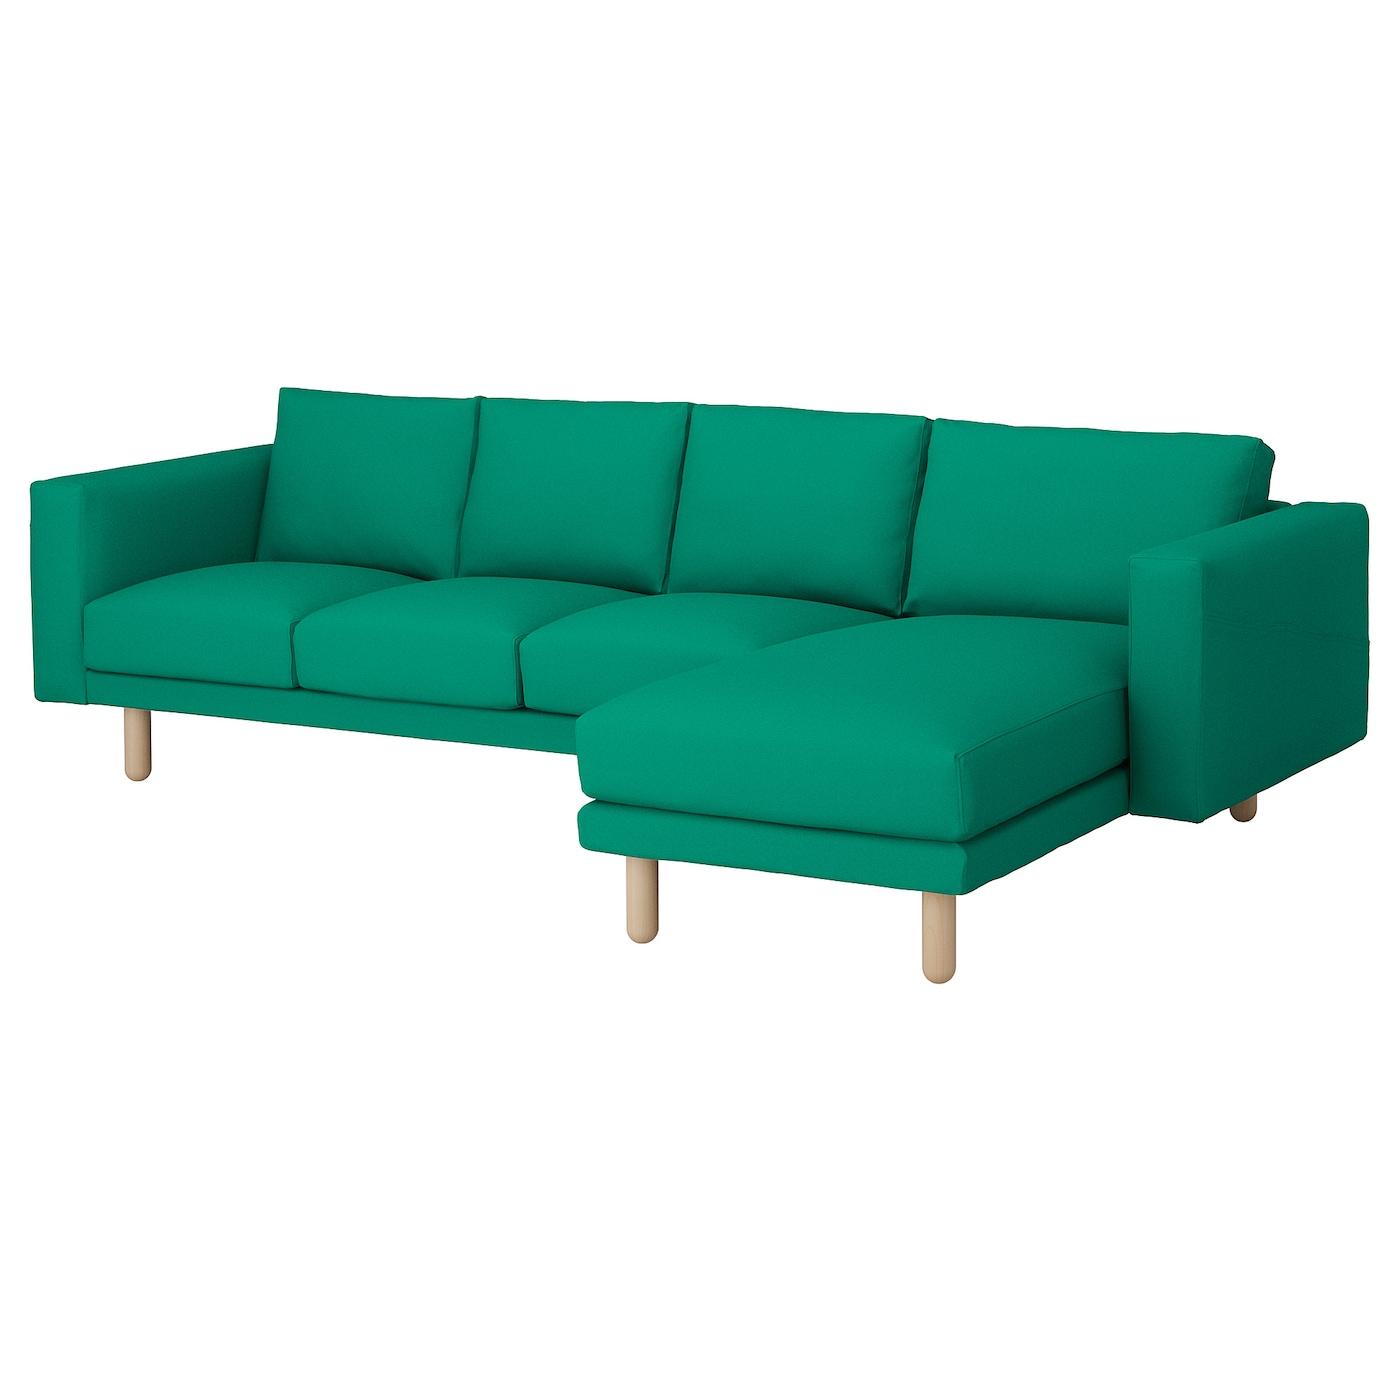 Three seater sofas ikea ireland dublin for Chaise longue ireland